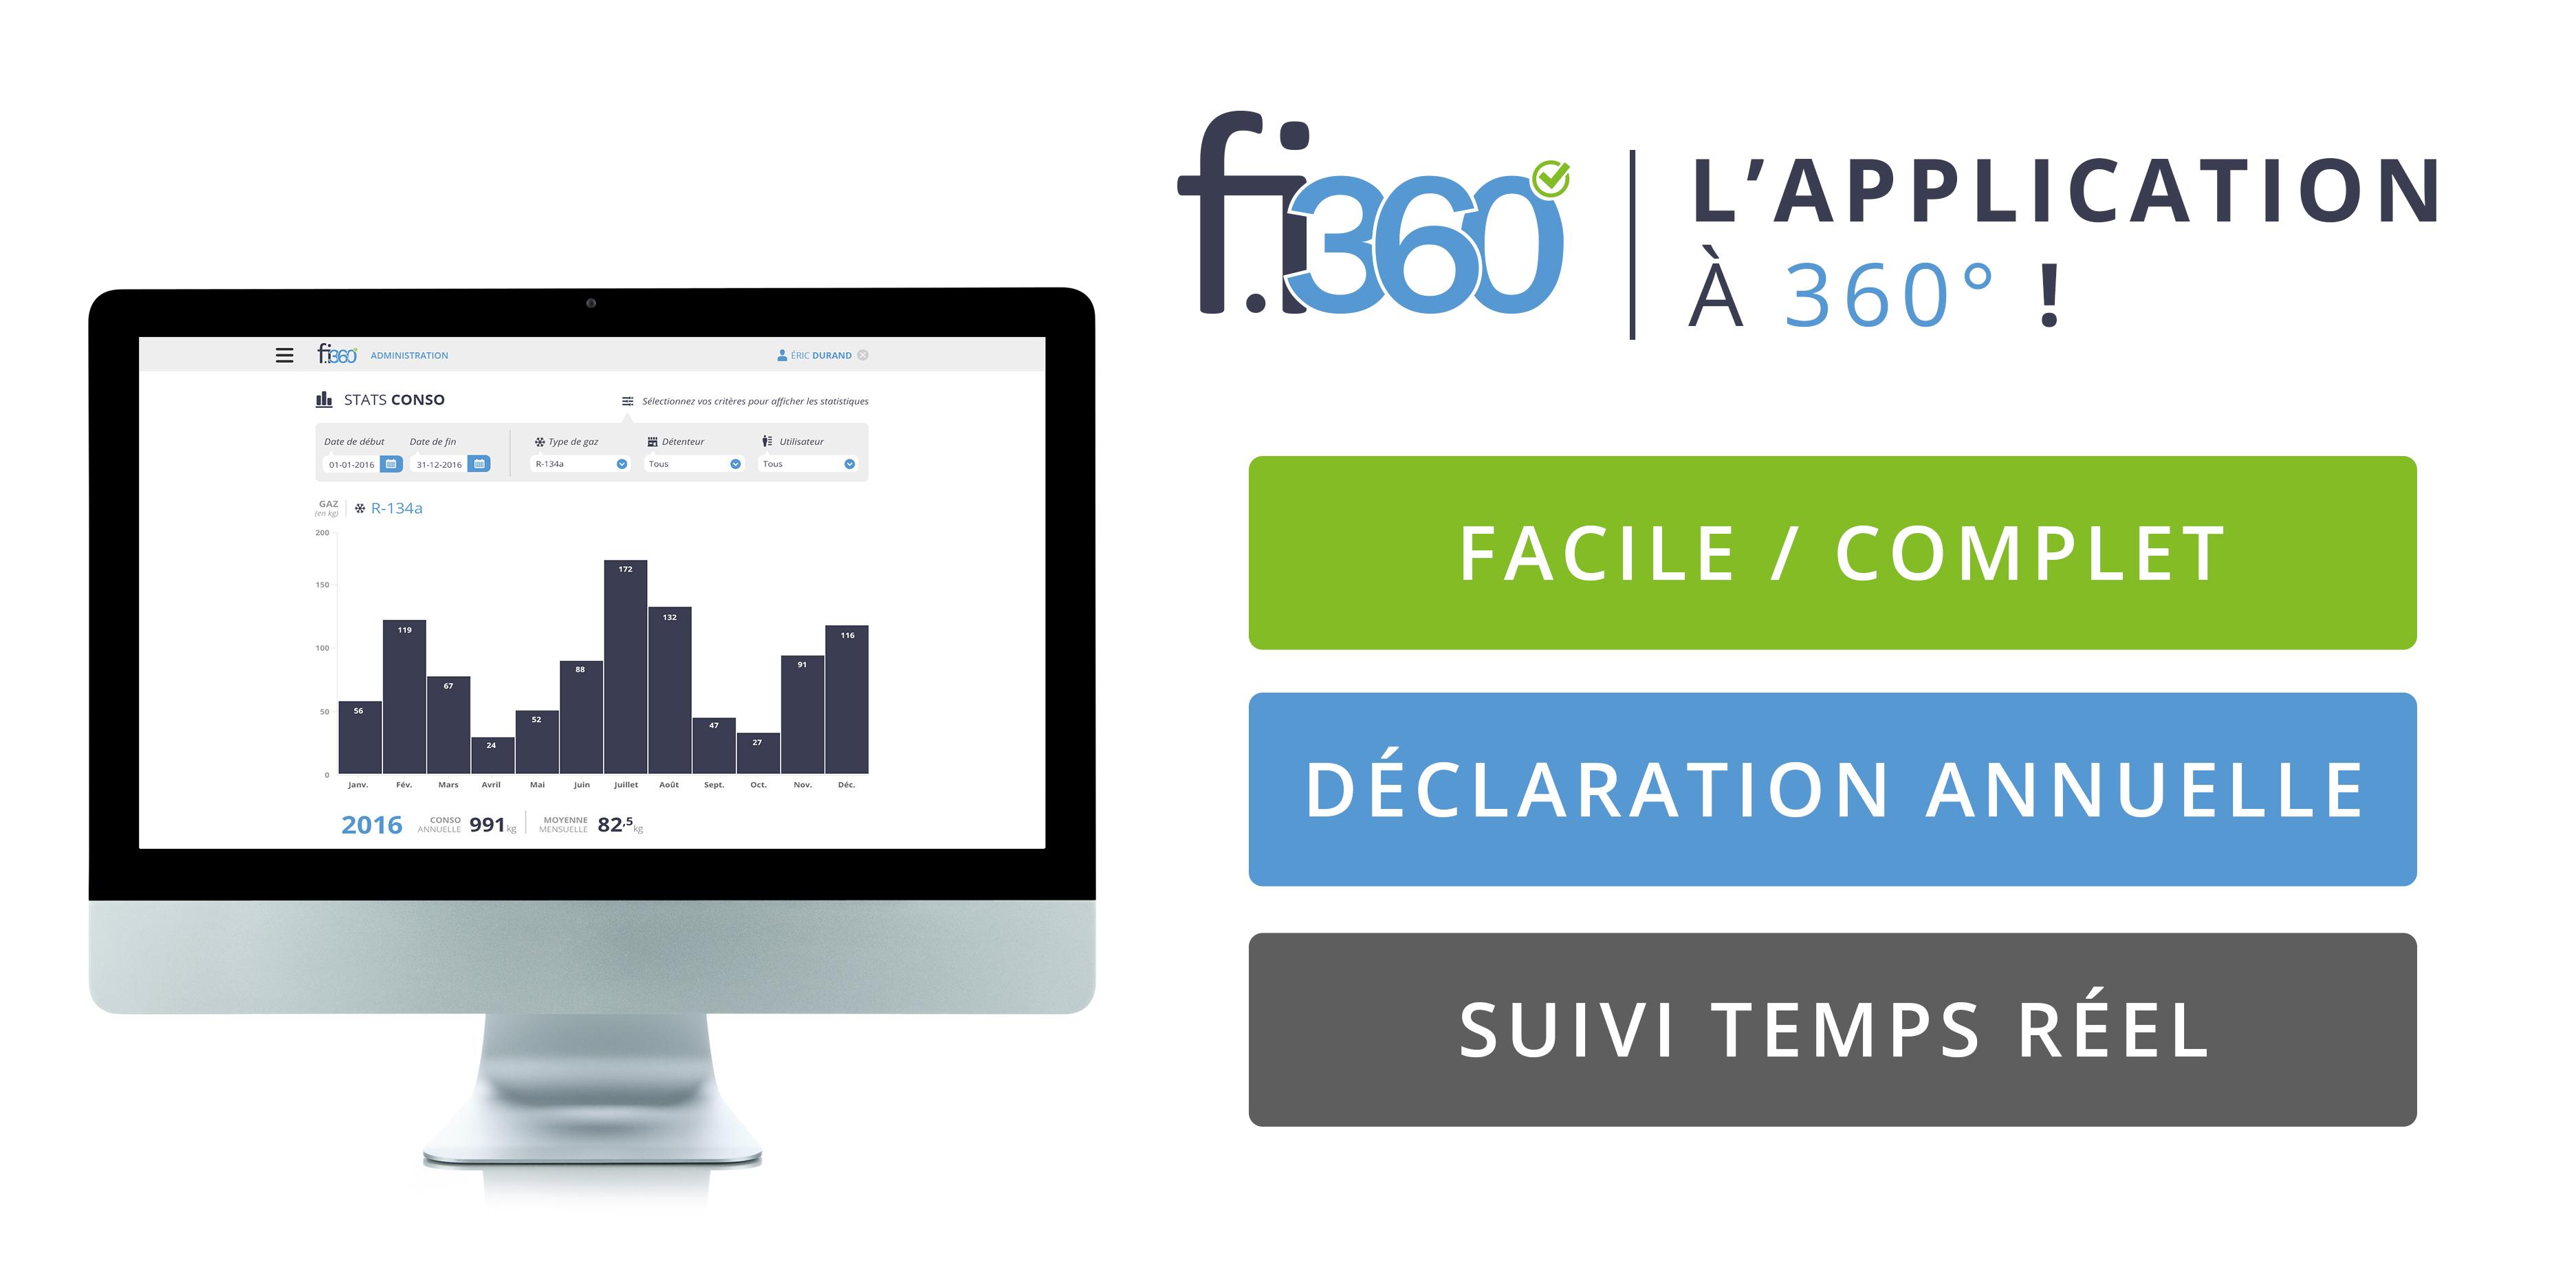 fi360-presentation-interface-gestion.jpg